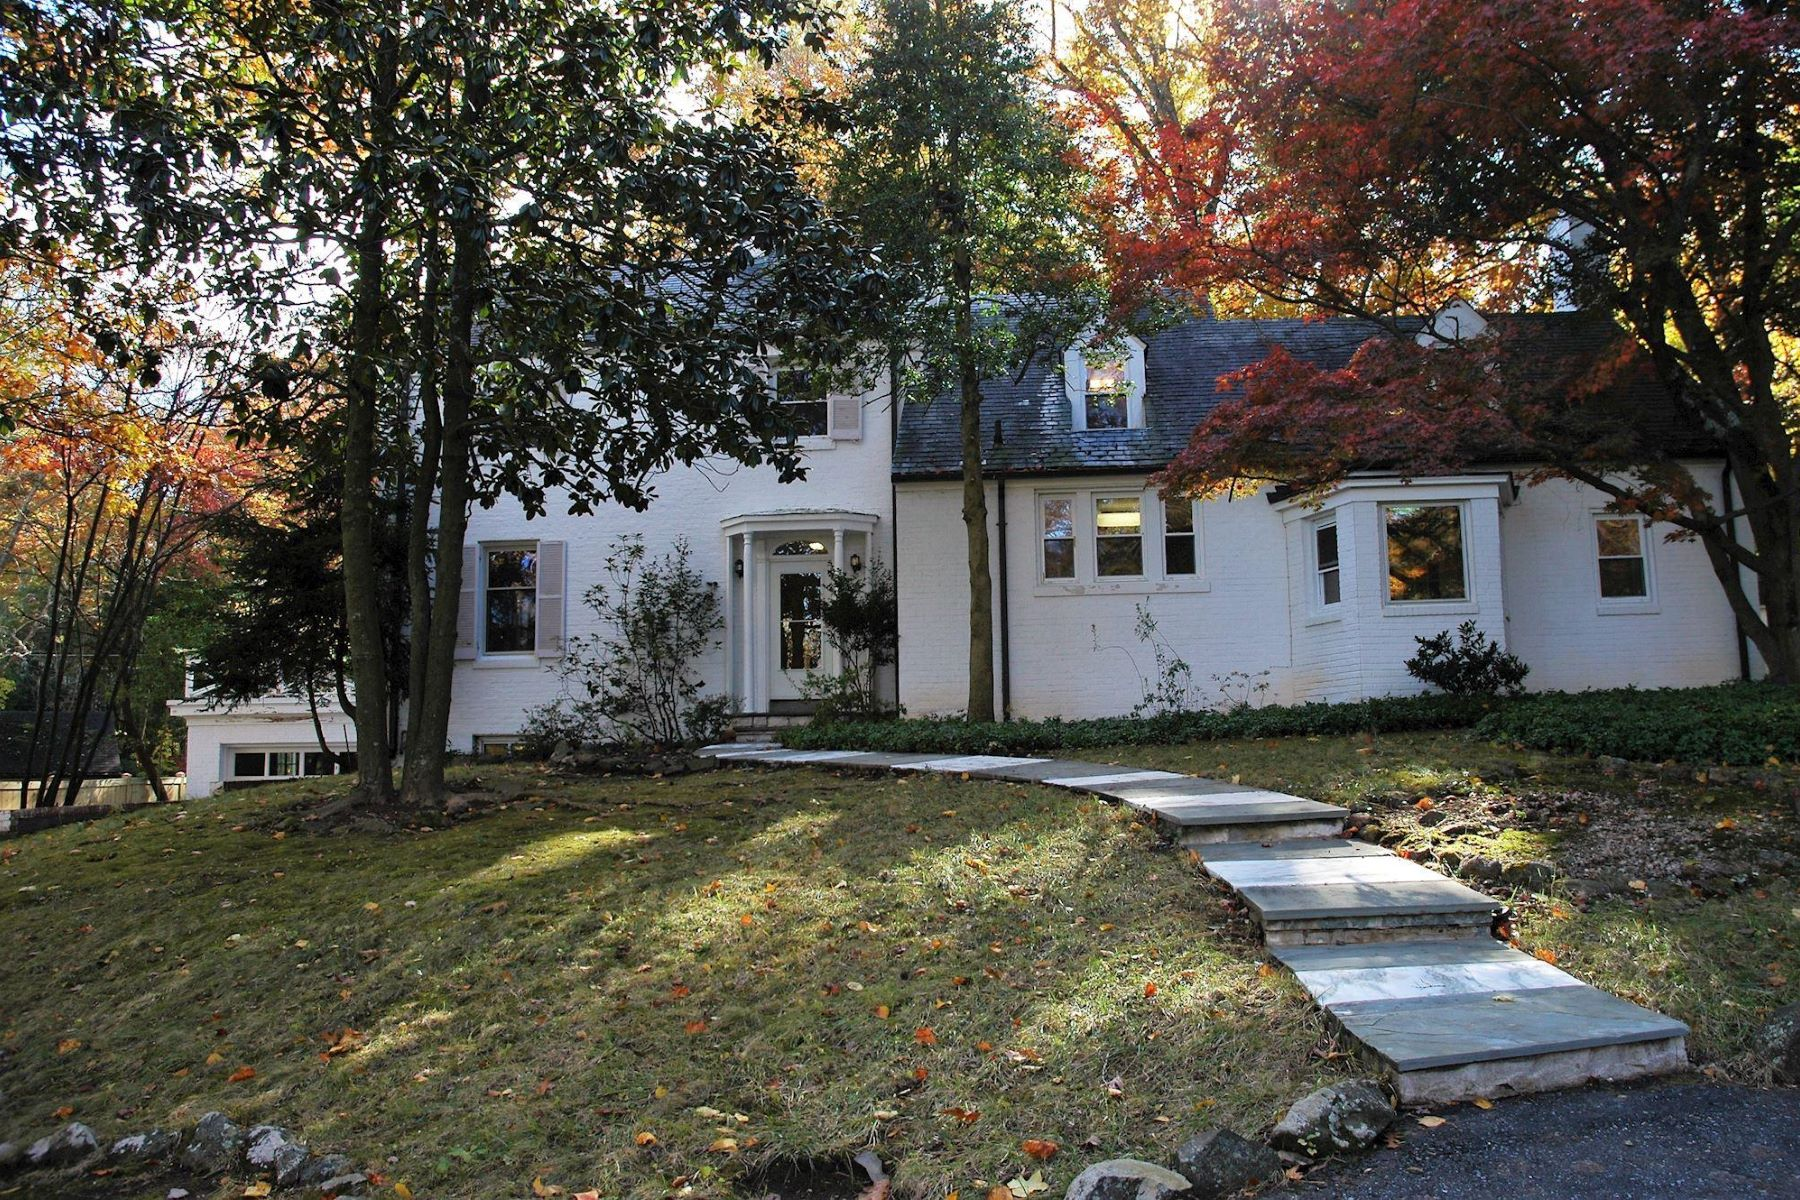 Single Family Home for Rent at 6100 Bradley Blvd 6100 Bradley Blvd Bethesda, Maryland 20817 United States